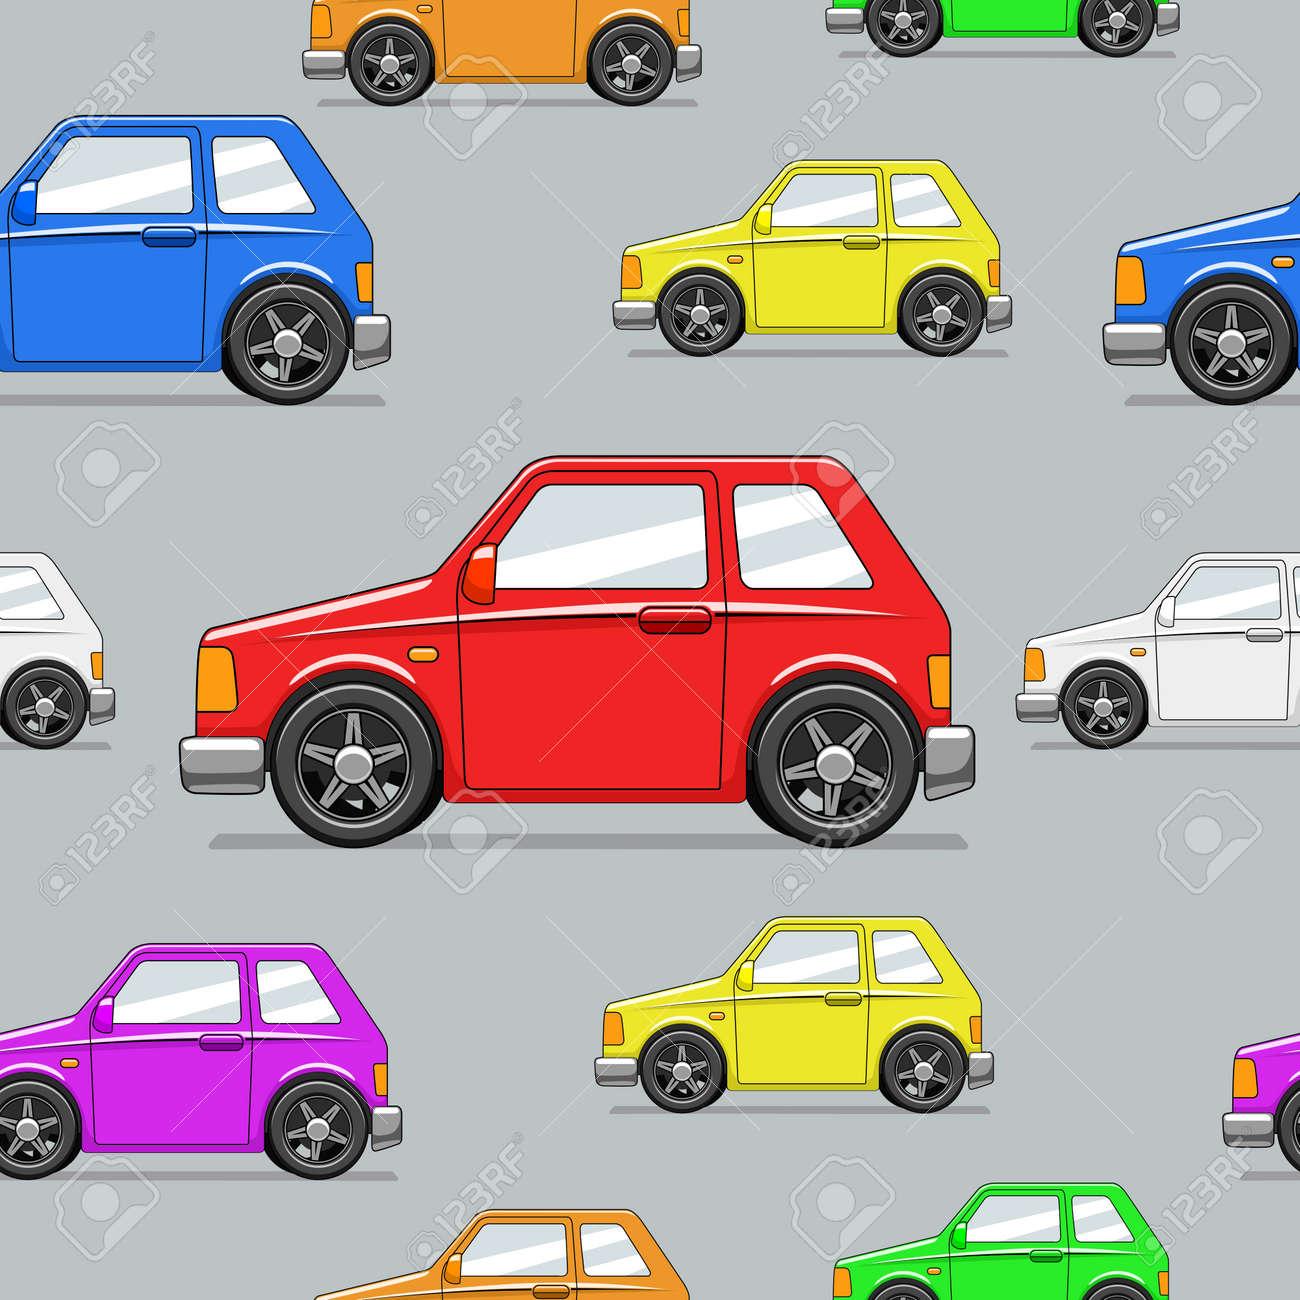 Ilustracion Vectorial Carro Tirado Sin Fisuras Patron De Dibujos